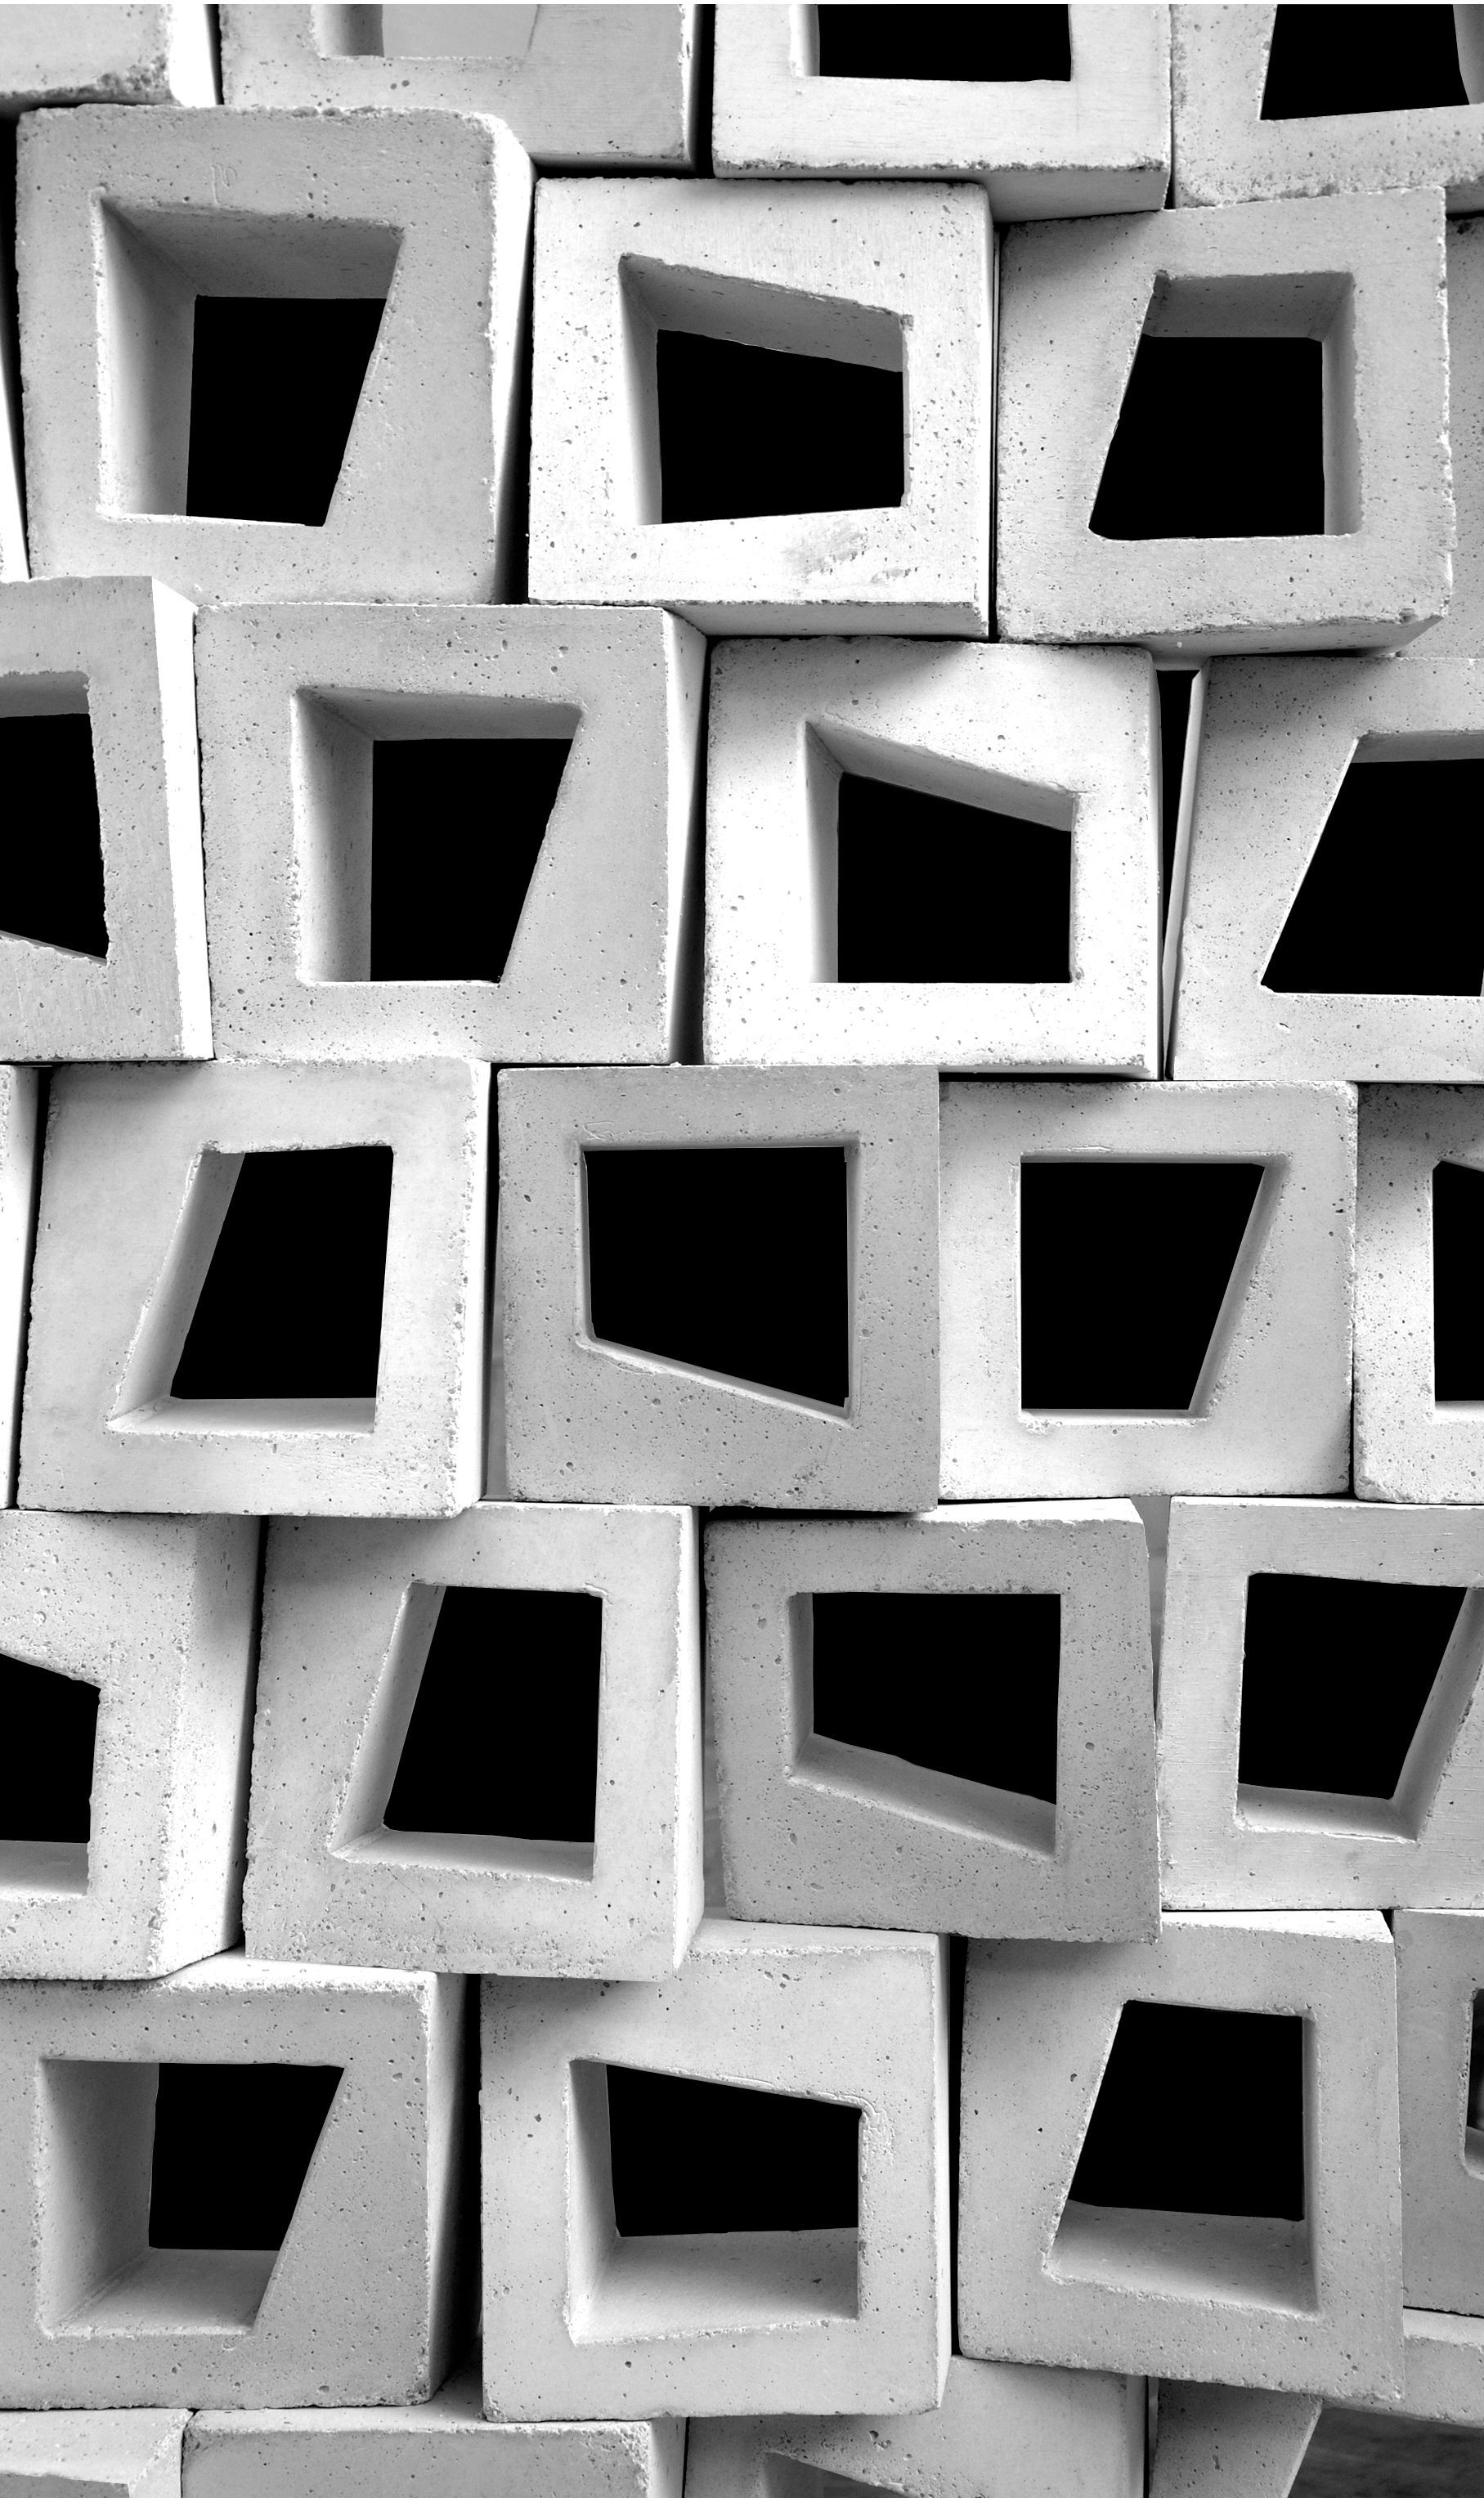 ark texture 020 urban design and architecture pinterest architecture student beautiful. Black Bedroom Furniture Sets. Home Design Ideas